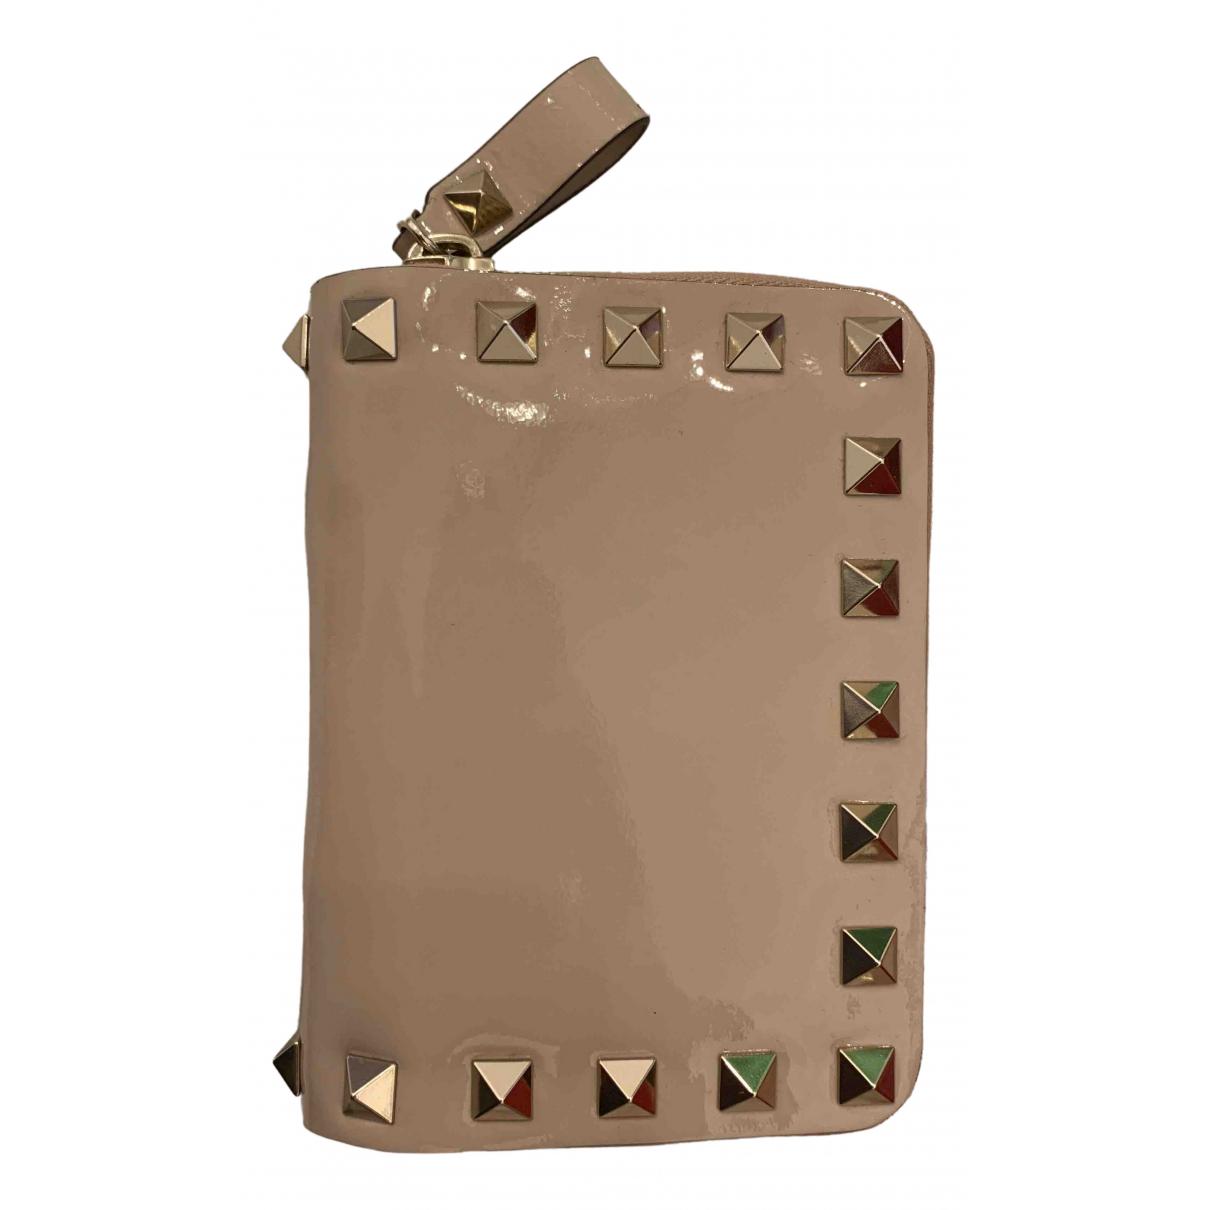 Valentino Garavani \N Beige Patent leather wallet for Women \N